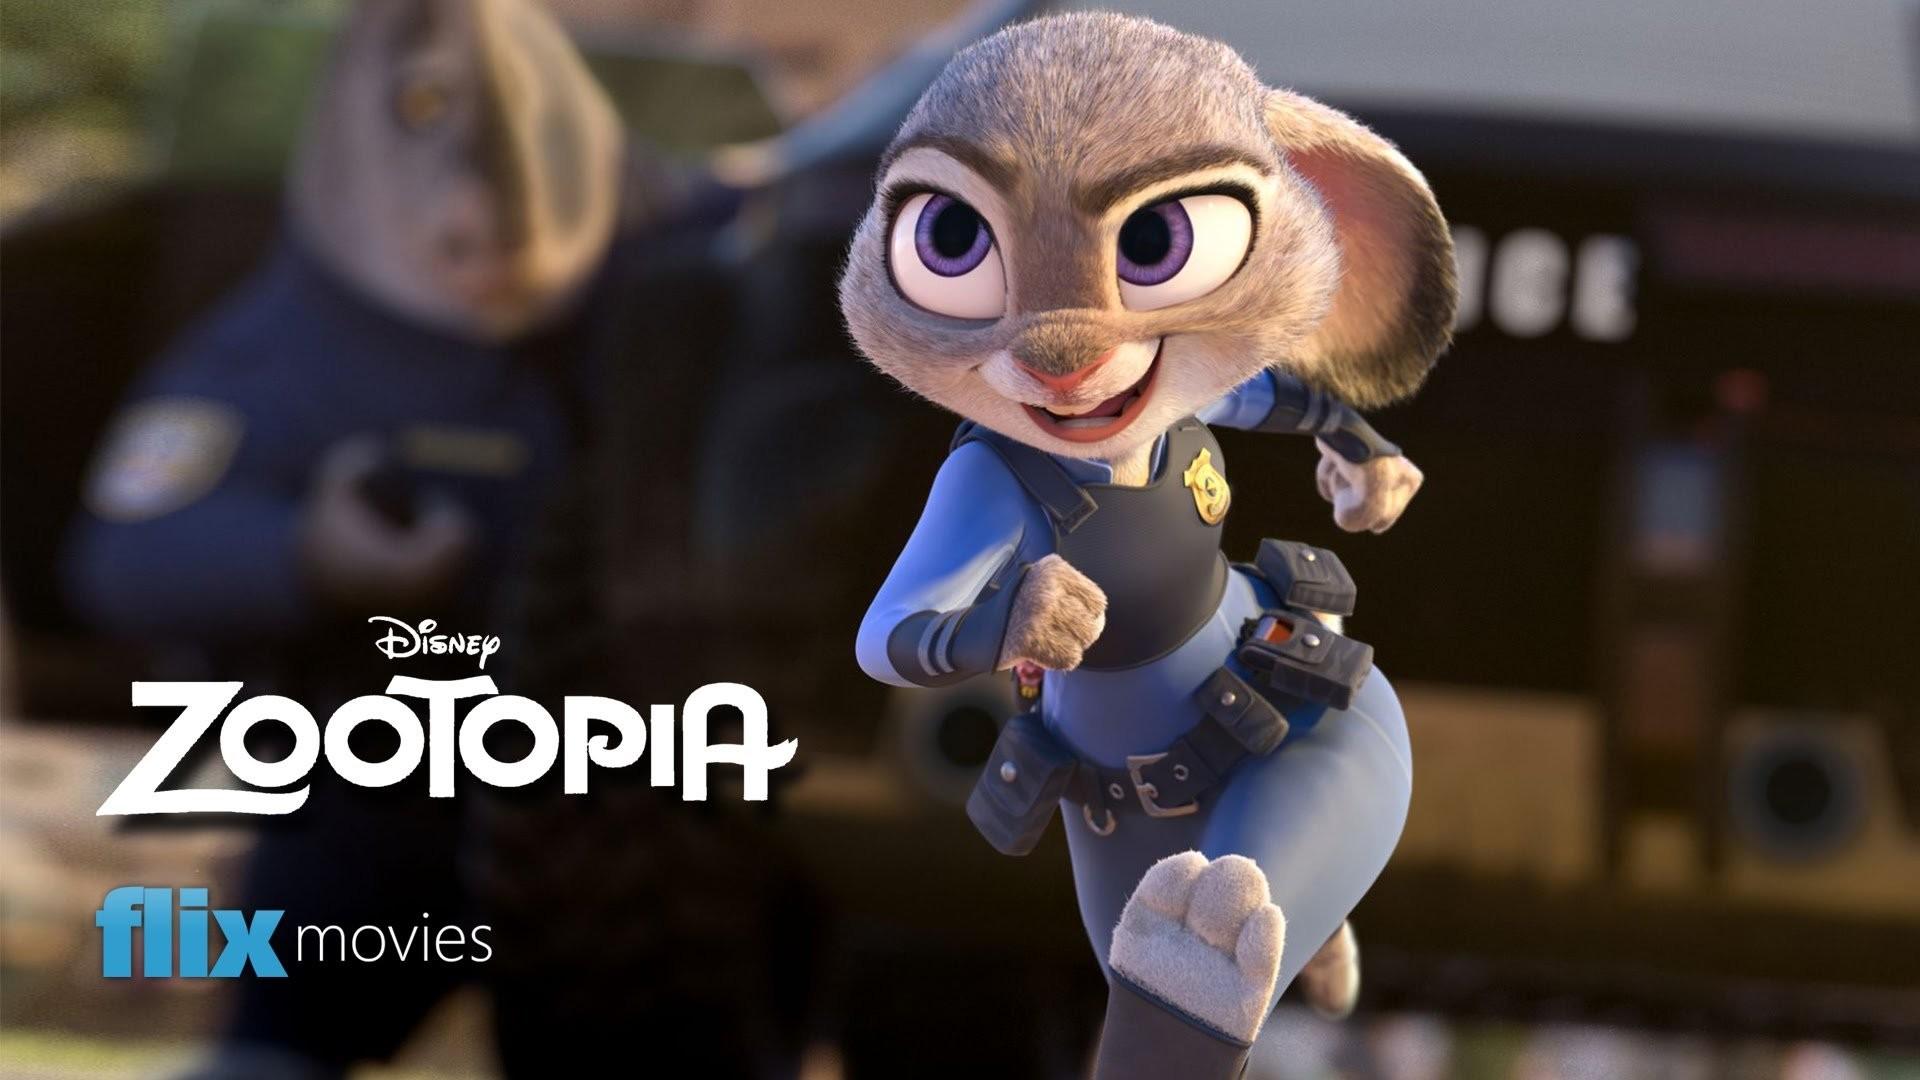 ZOOTOPIA disney animation comedy family action adventure fox foxes 1zoot  poster wallpaper